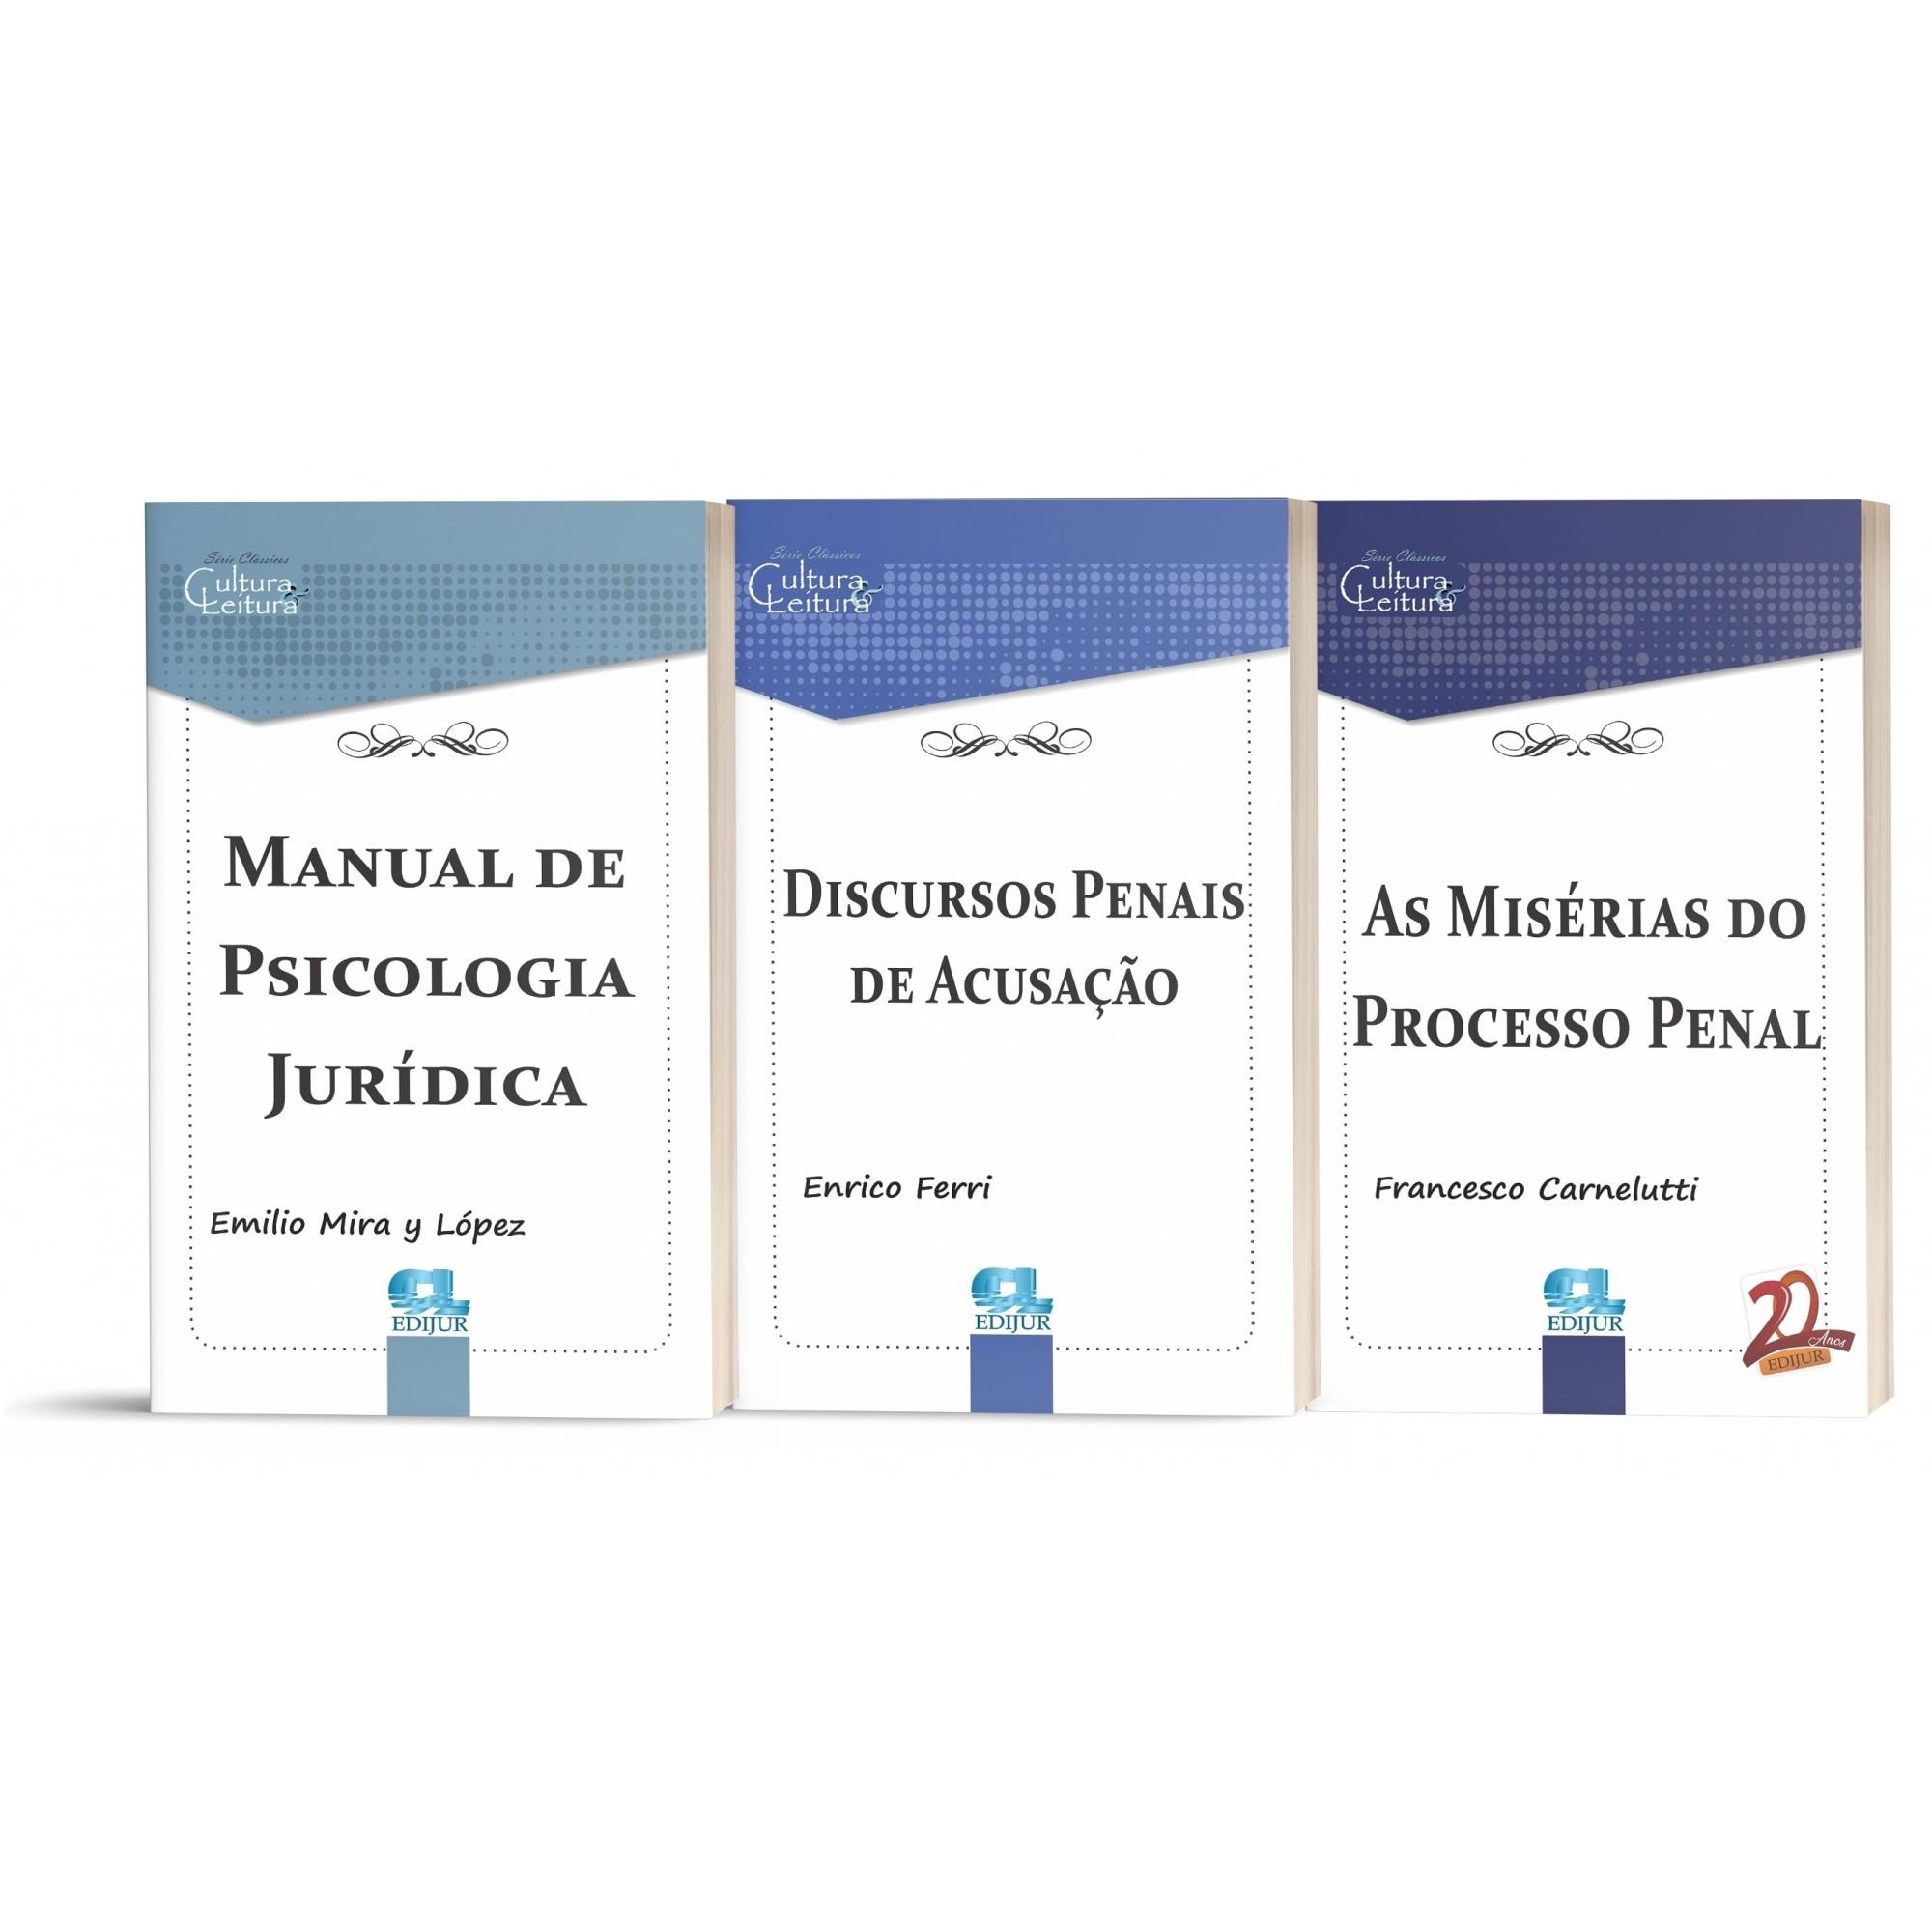 Combo Clássicos do Direito - Criminalista - 11 volumes  - Edijur Editora